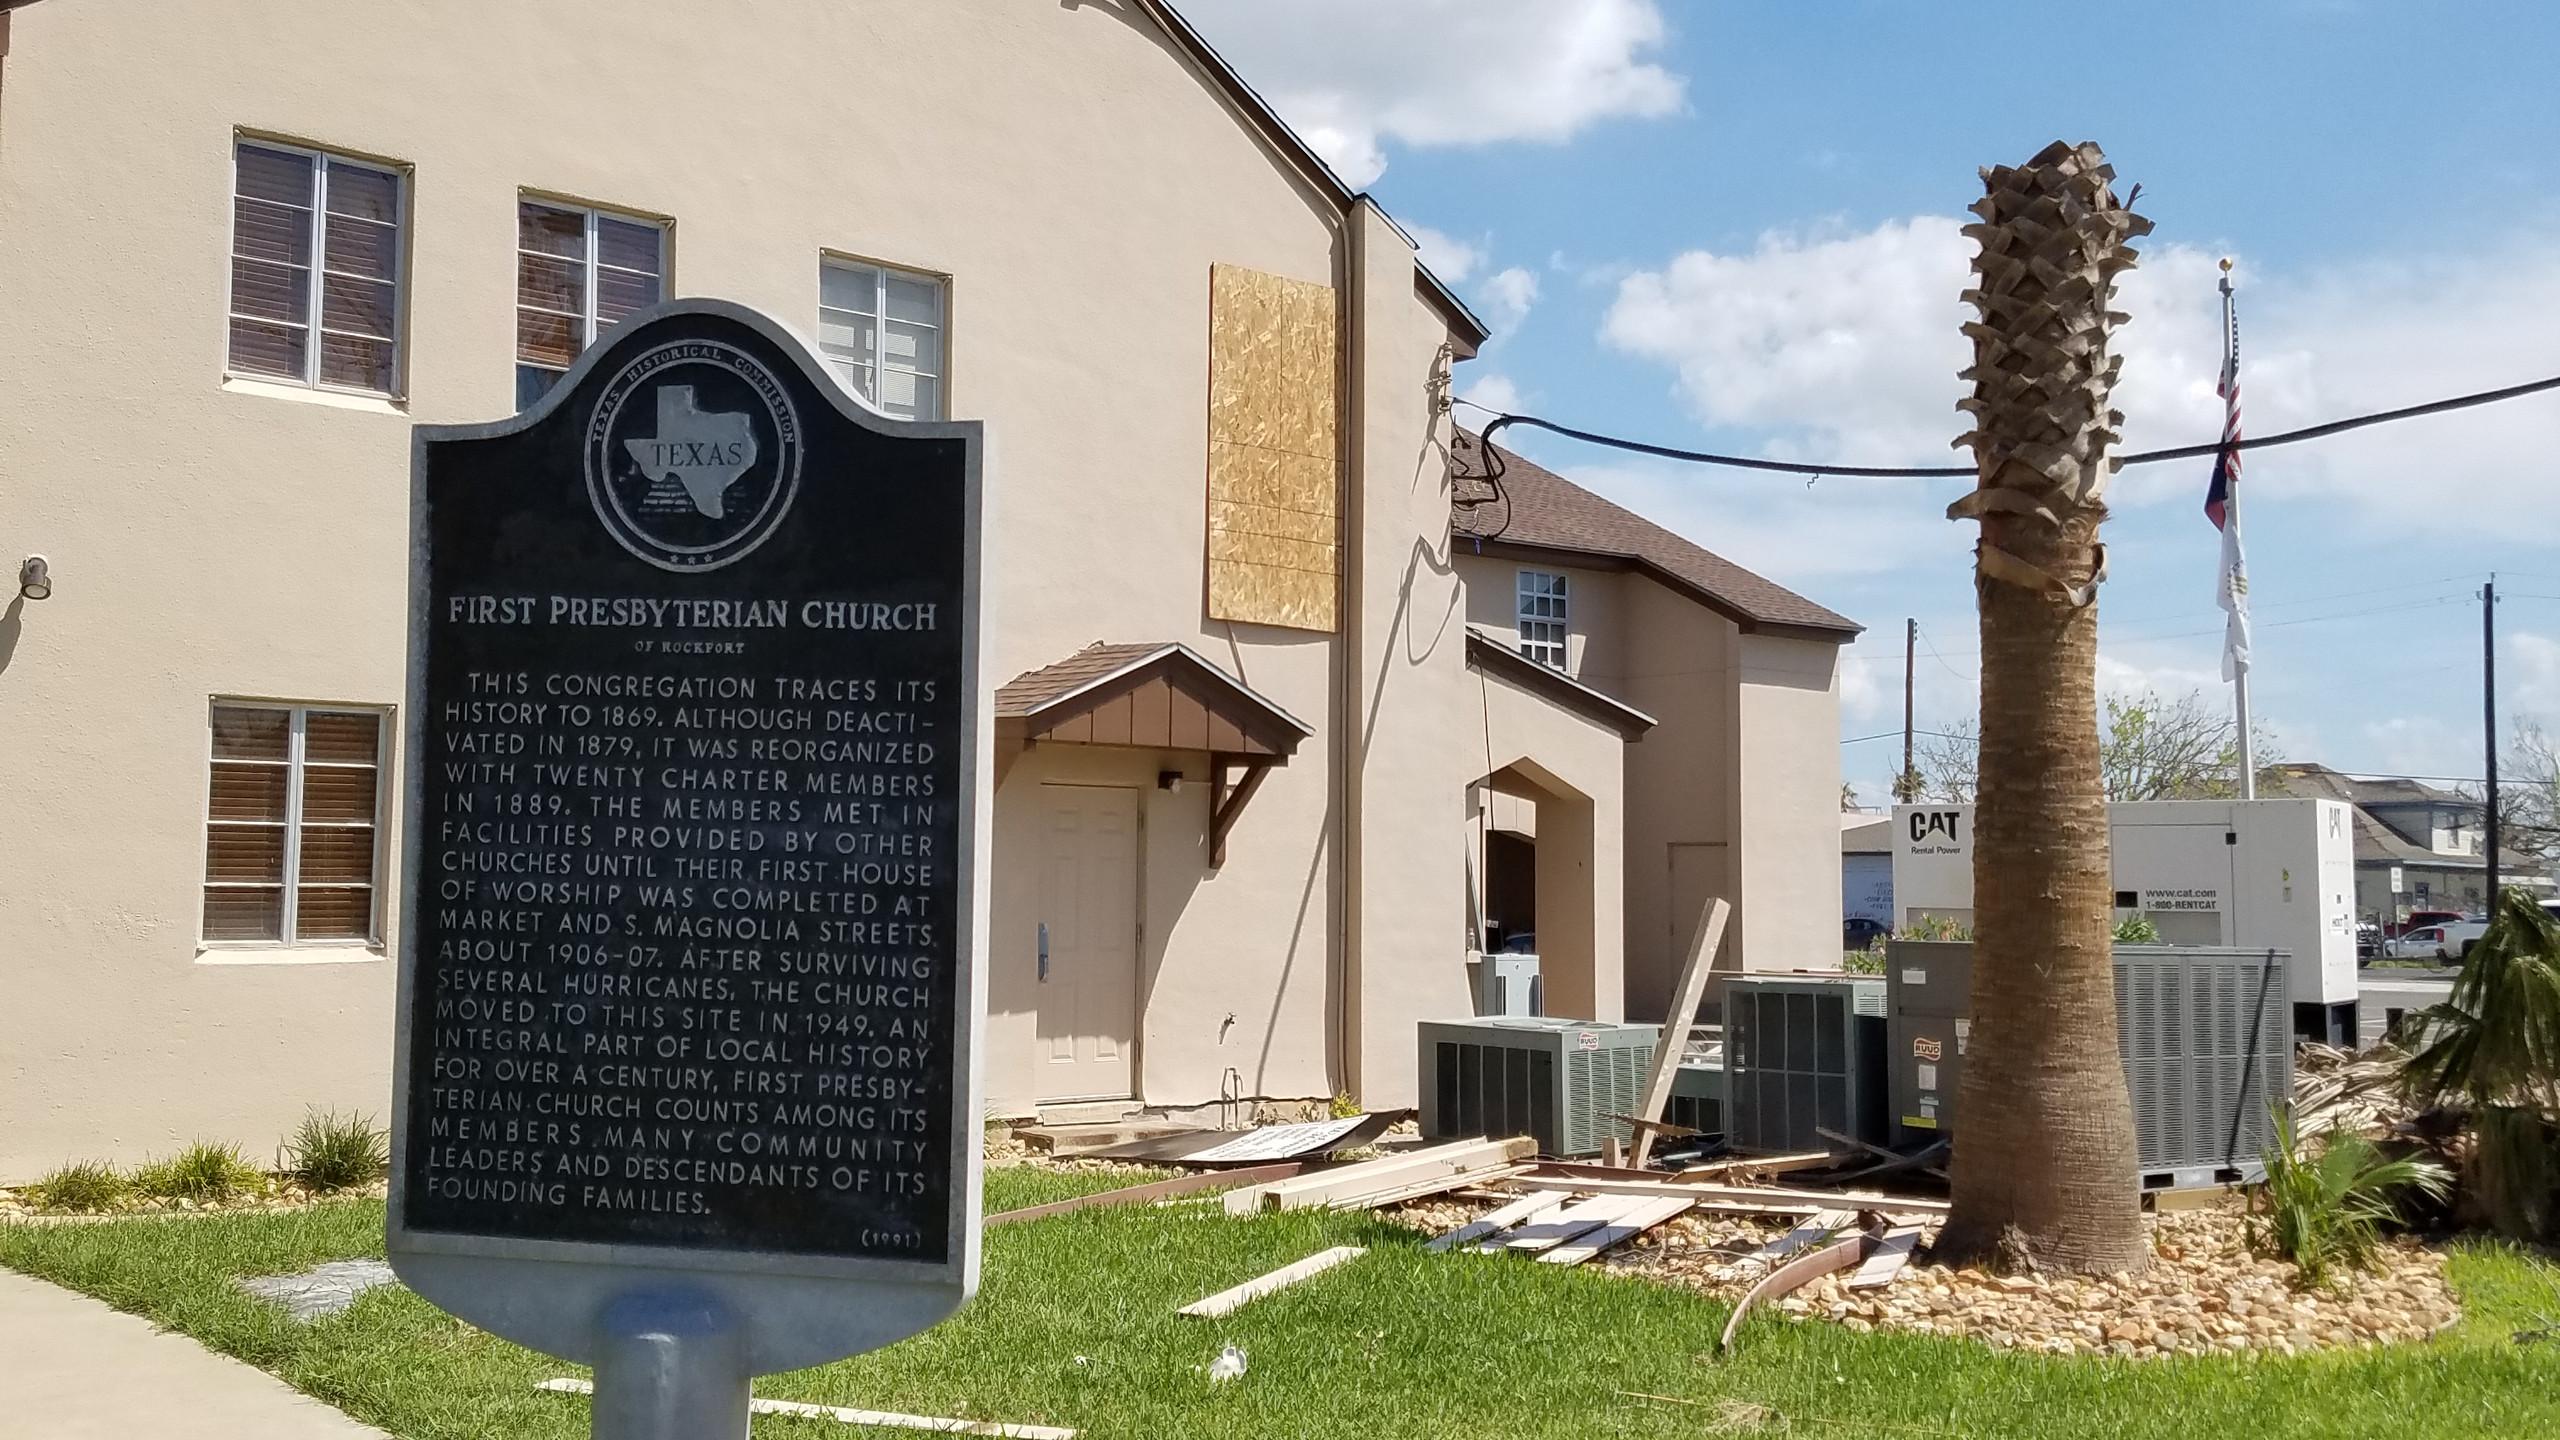 FPC Rockport, TX